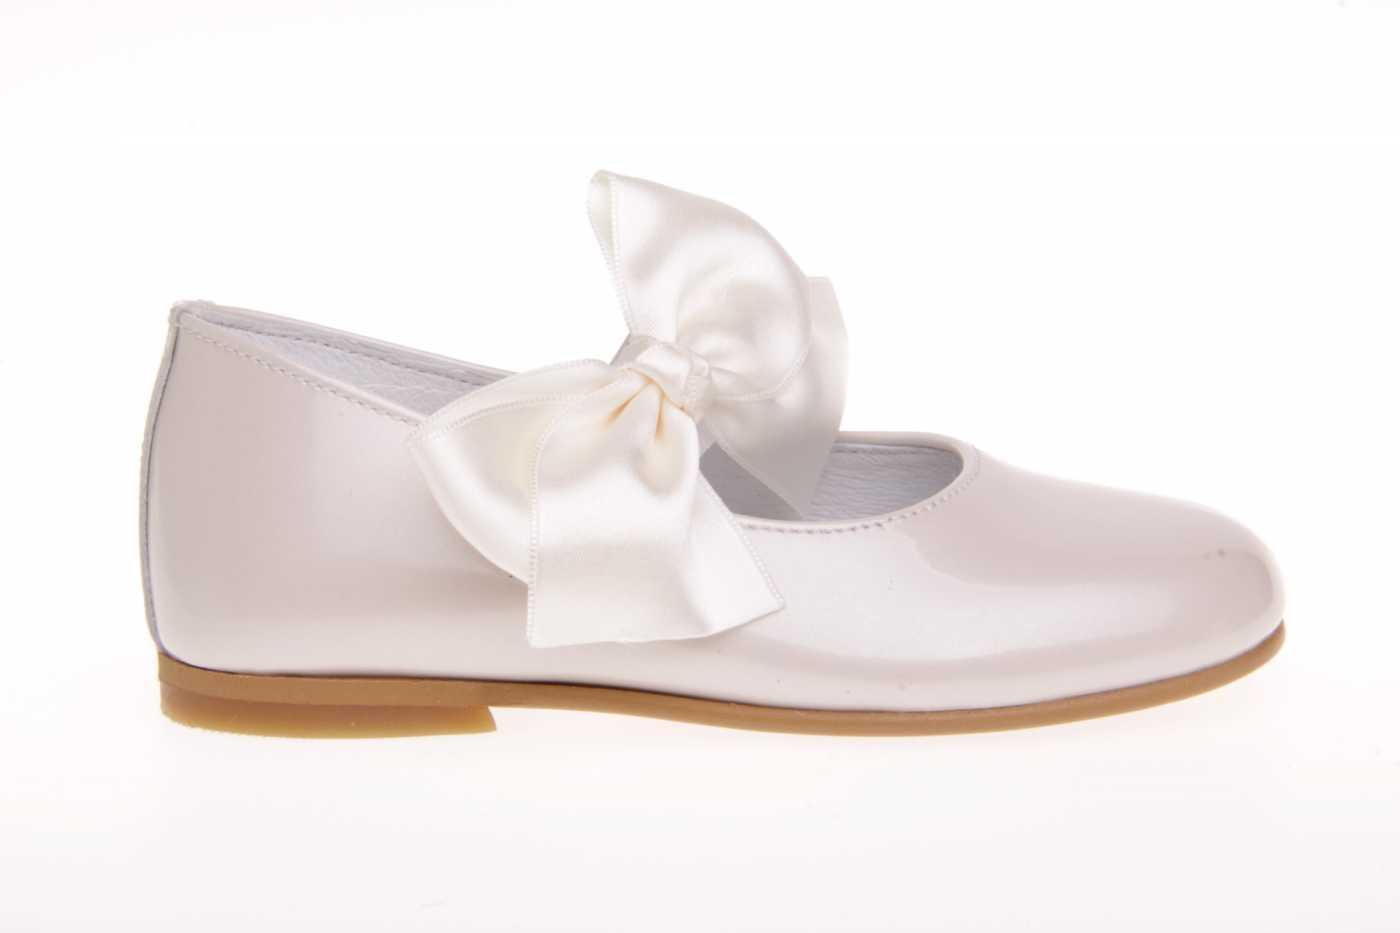 7438cc85a7 Comprar zapato tipo JOVEN NIÑA estilo MERCEDES COLOR BEIGE CHAROL ...